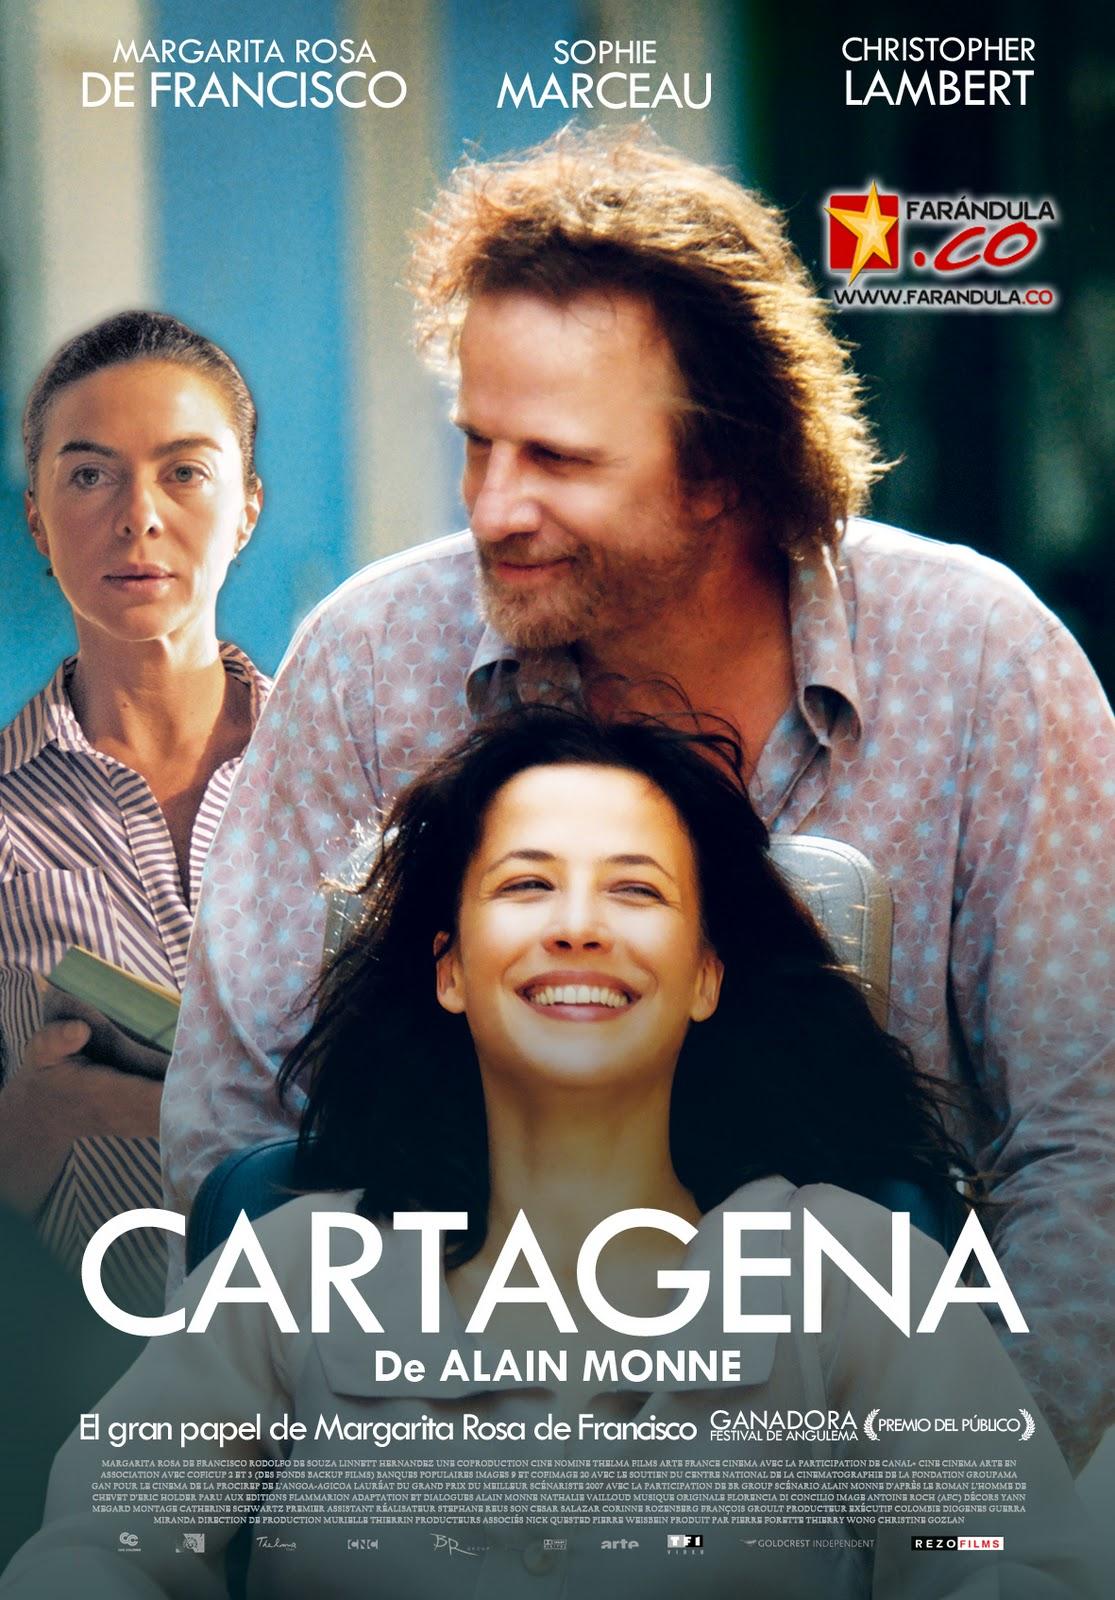 http://4.bp.blogspot.com/_XBW9ZBo_lto/TOp-RYEEuQI/AAAAAAAAADQ/FxYvRoM33Kg/s1600/cartagena.jpg